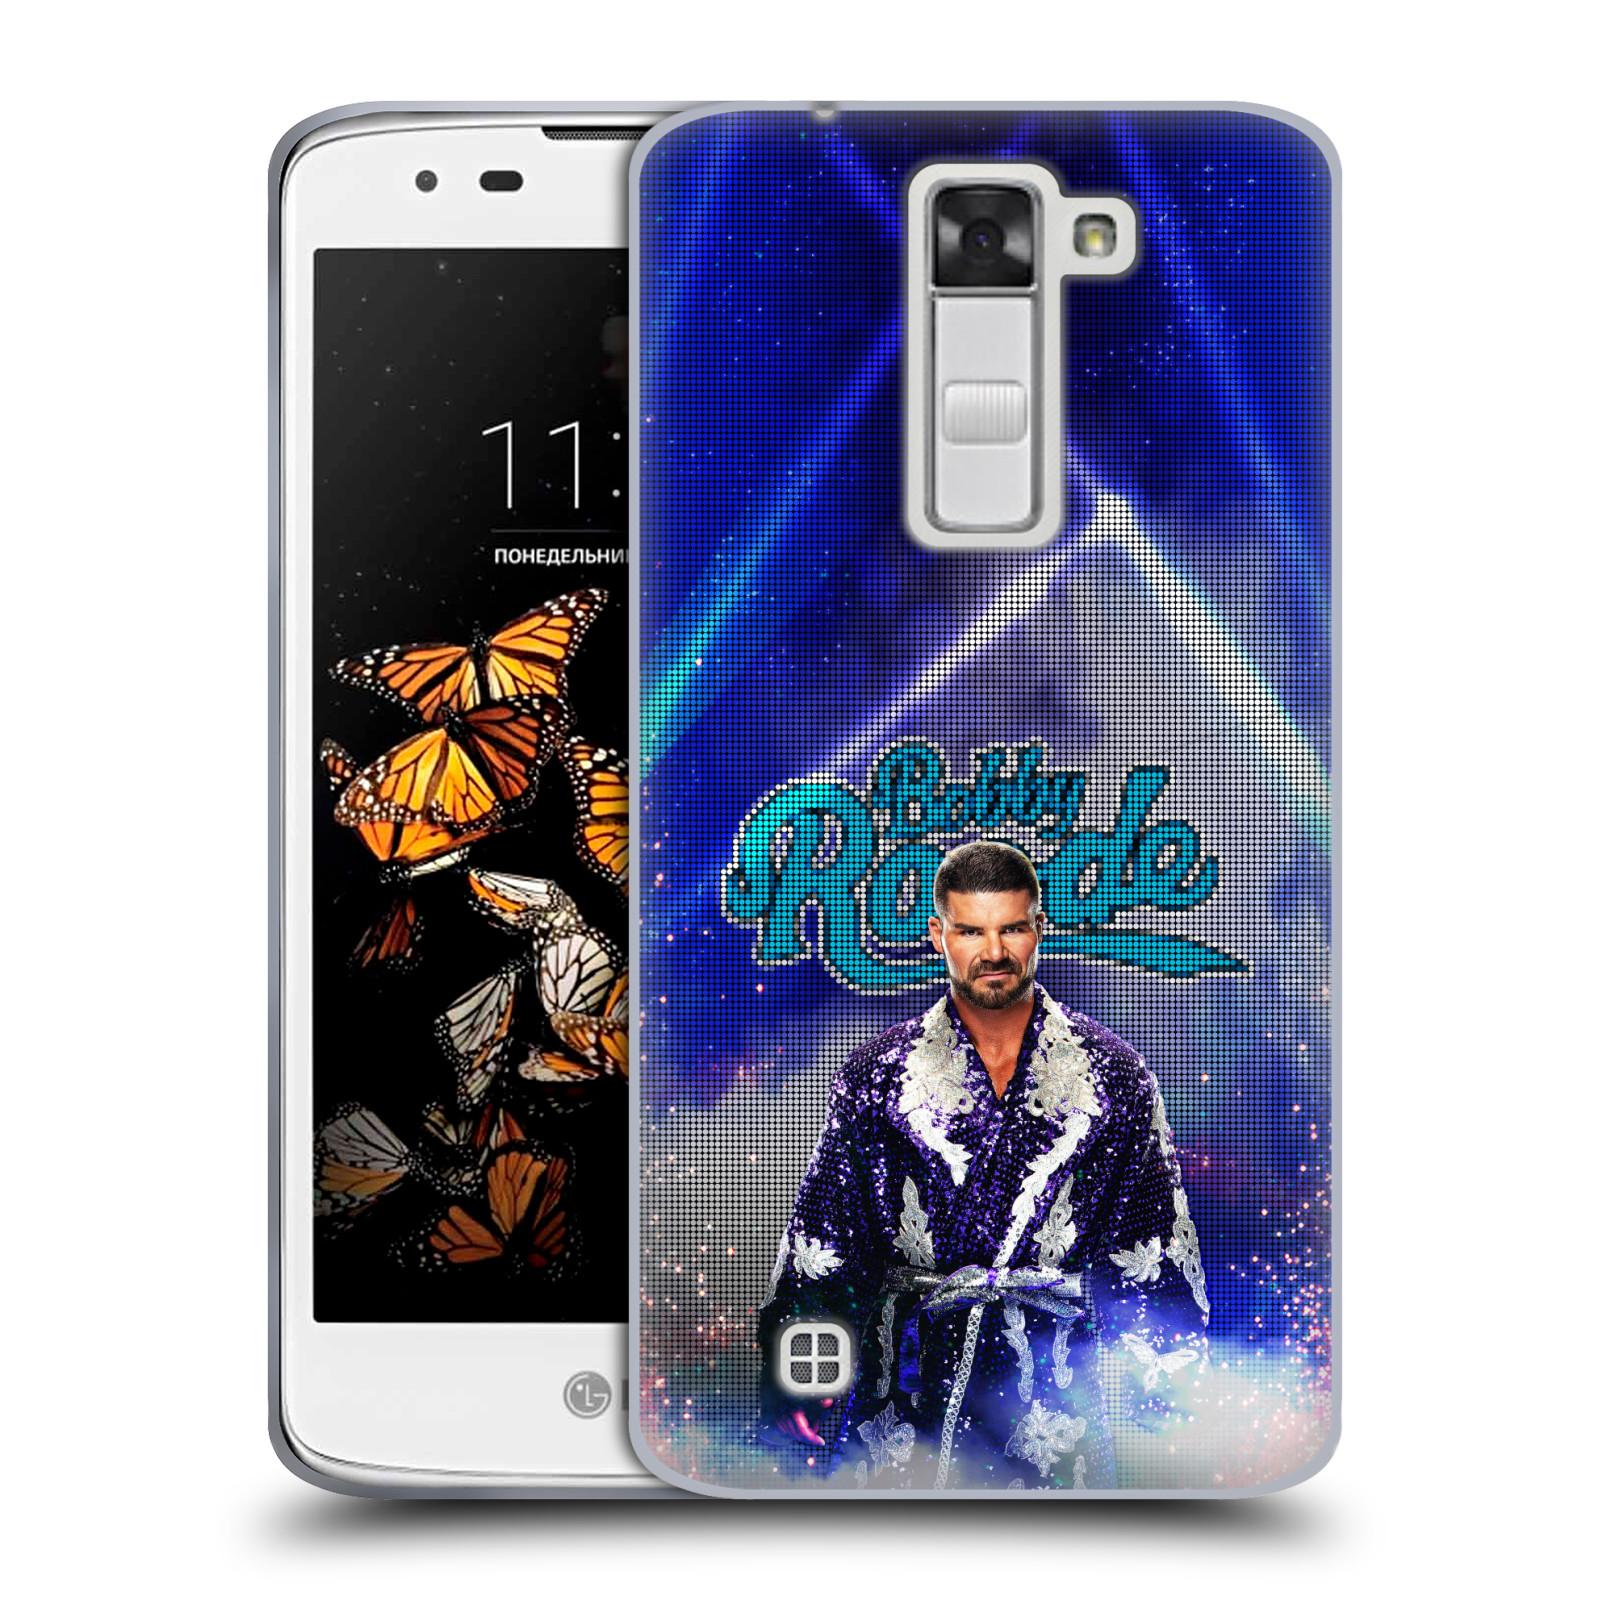 OFFICIAL-WWE-BOBBY-ROODE-SOFT-GEL-CASE-FOR-LG-PHONES-2